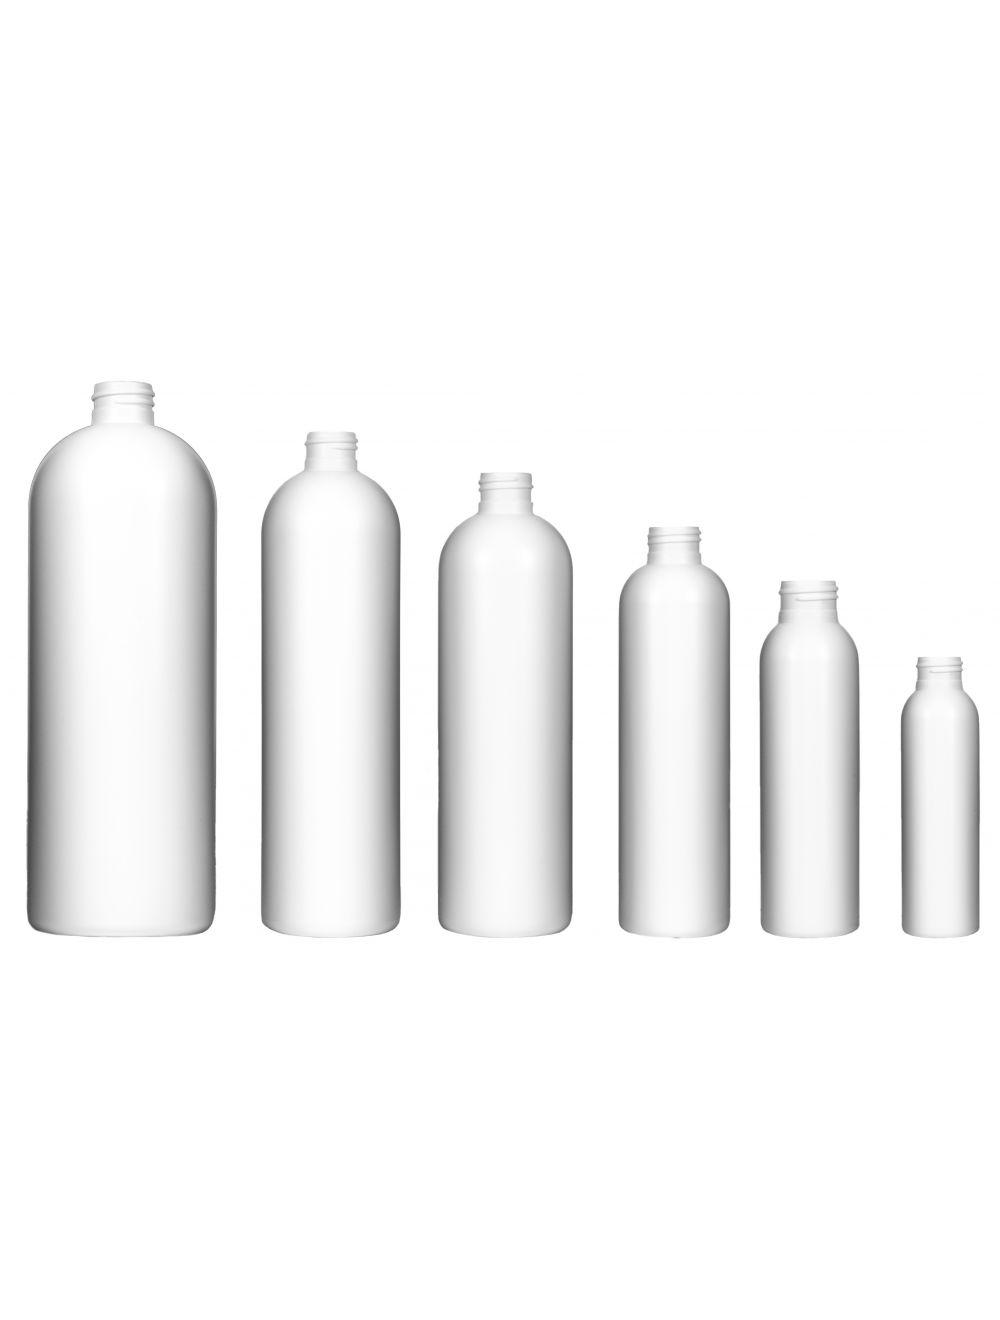 Imperial HDPE Bottles - White